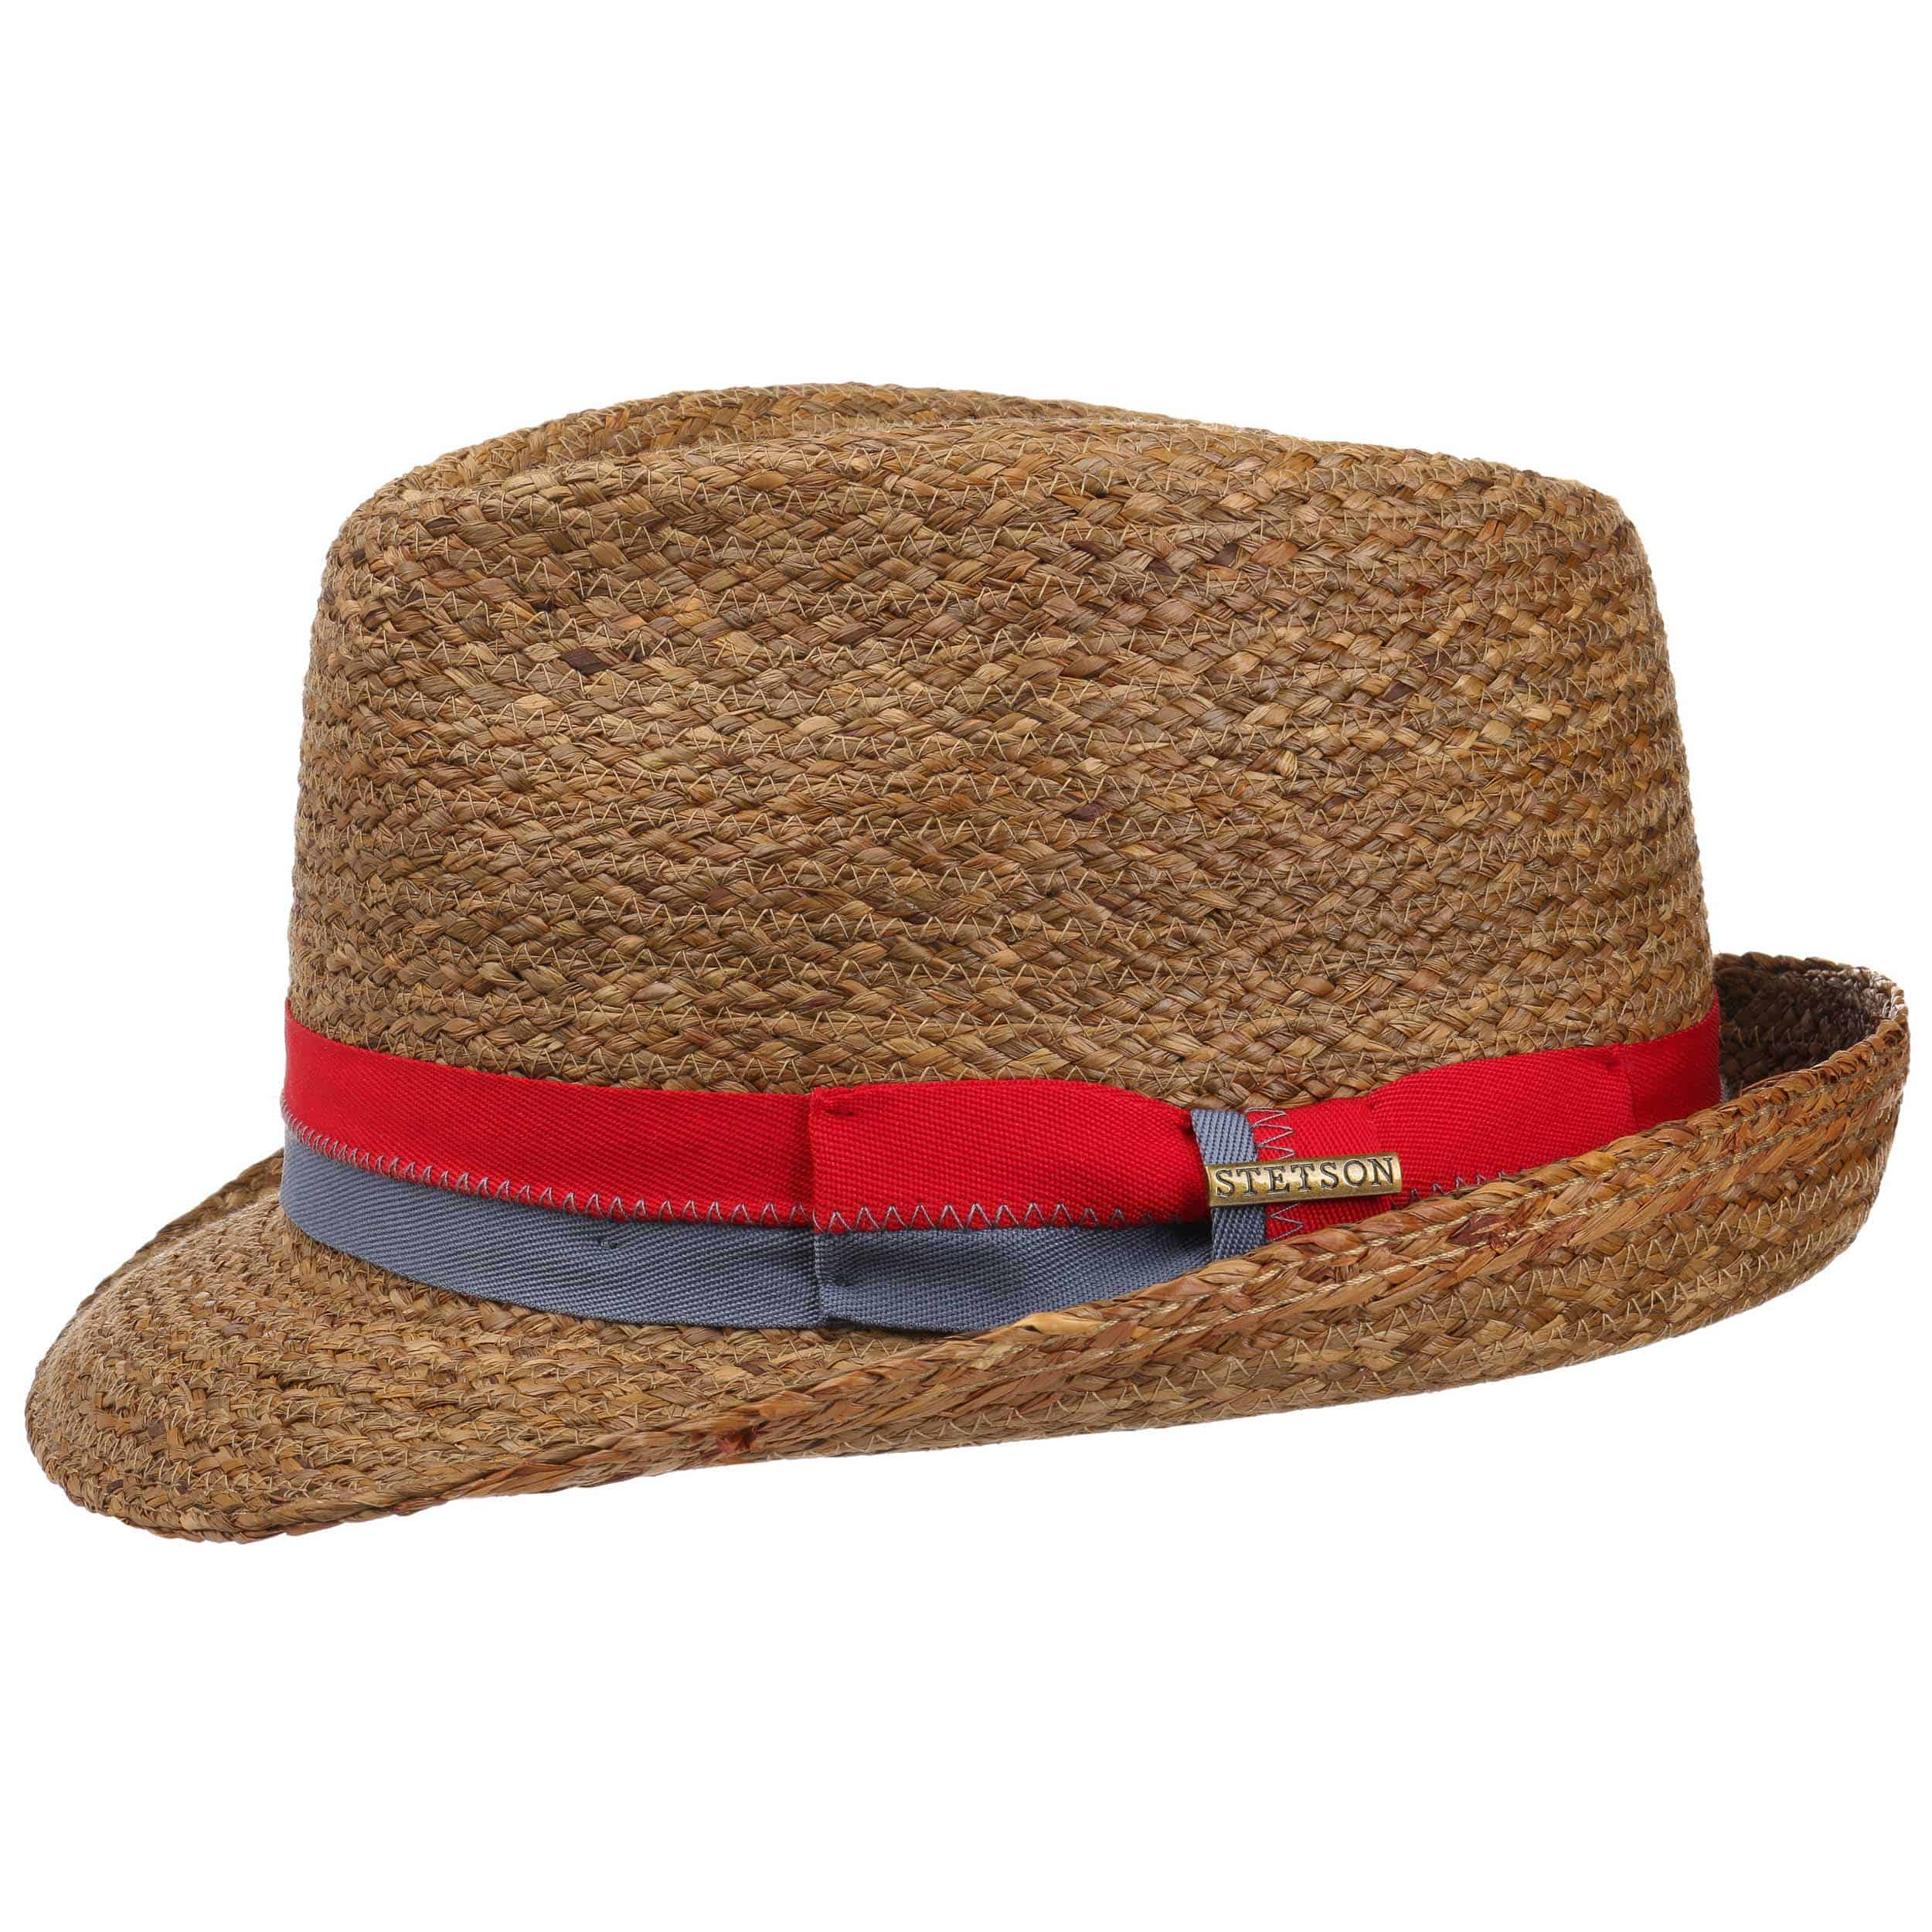 ... Laverne Trilby Raffia Hat by Stetson - brown 1 ... 4b9db852259